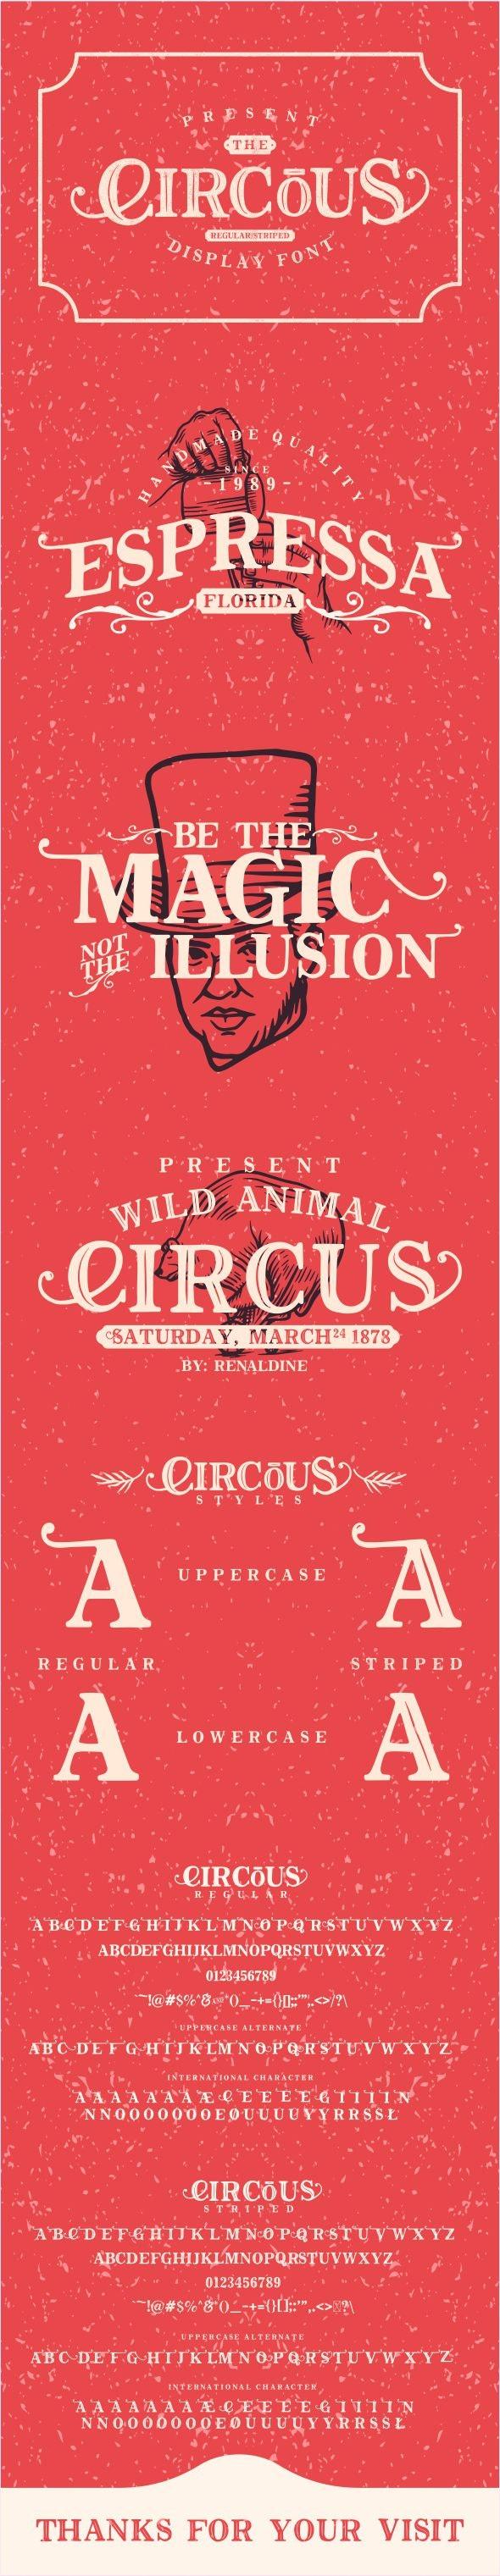 The Circous - Fancy Fonts